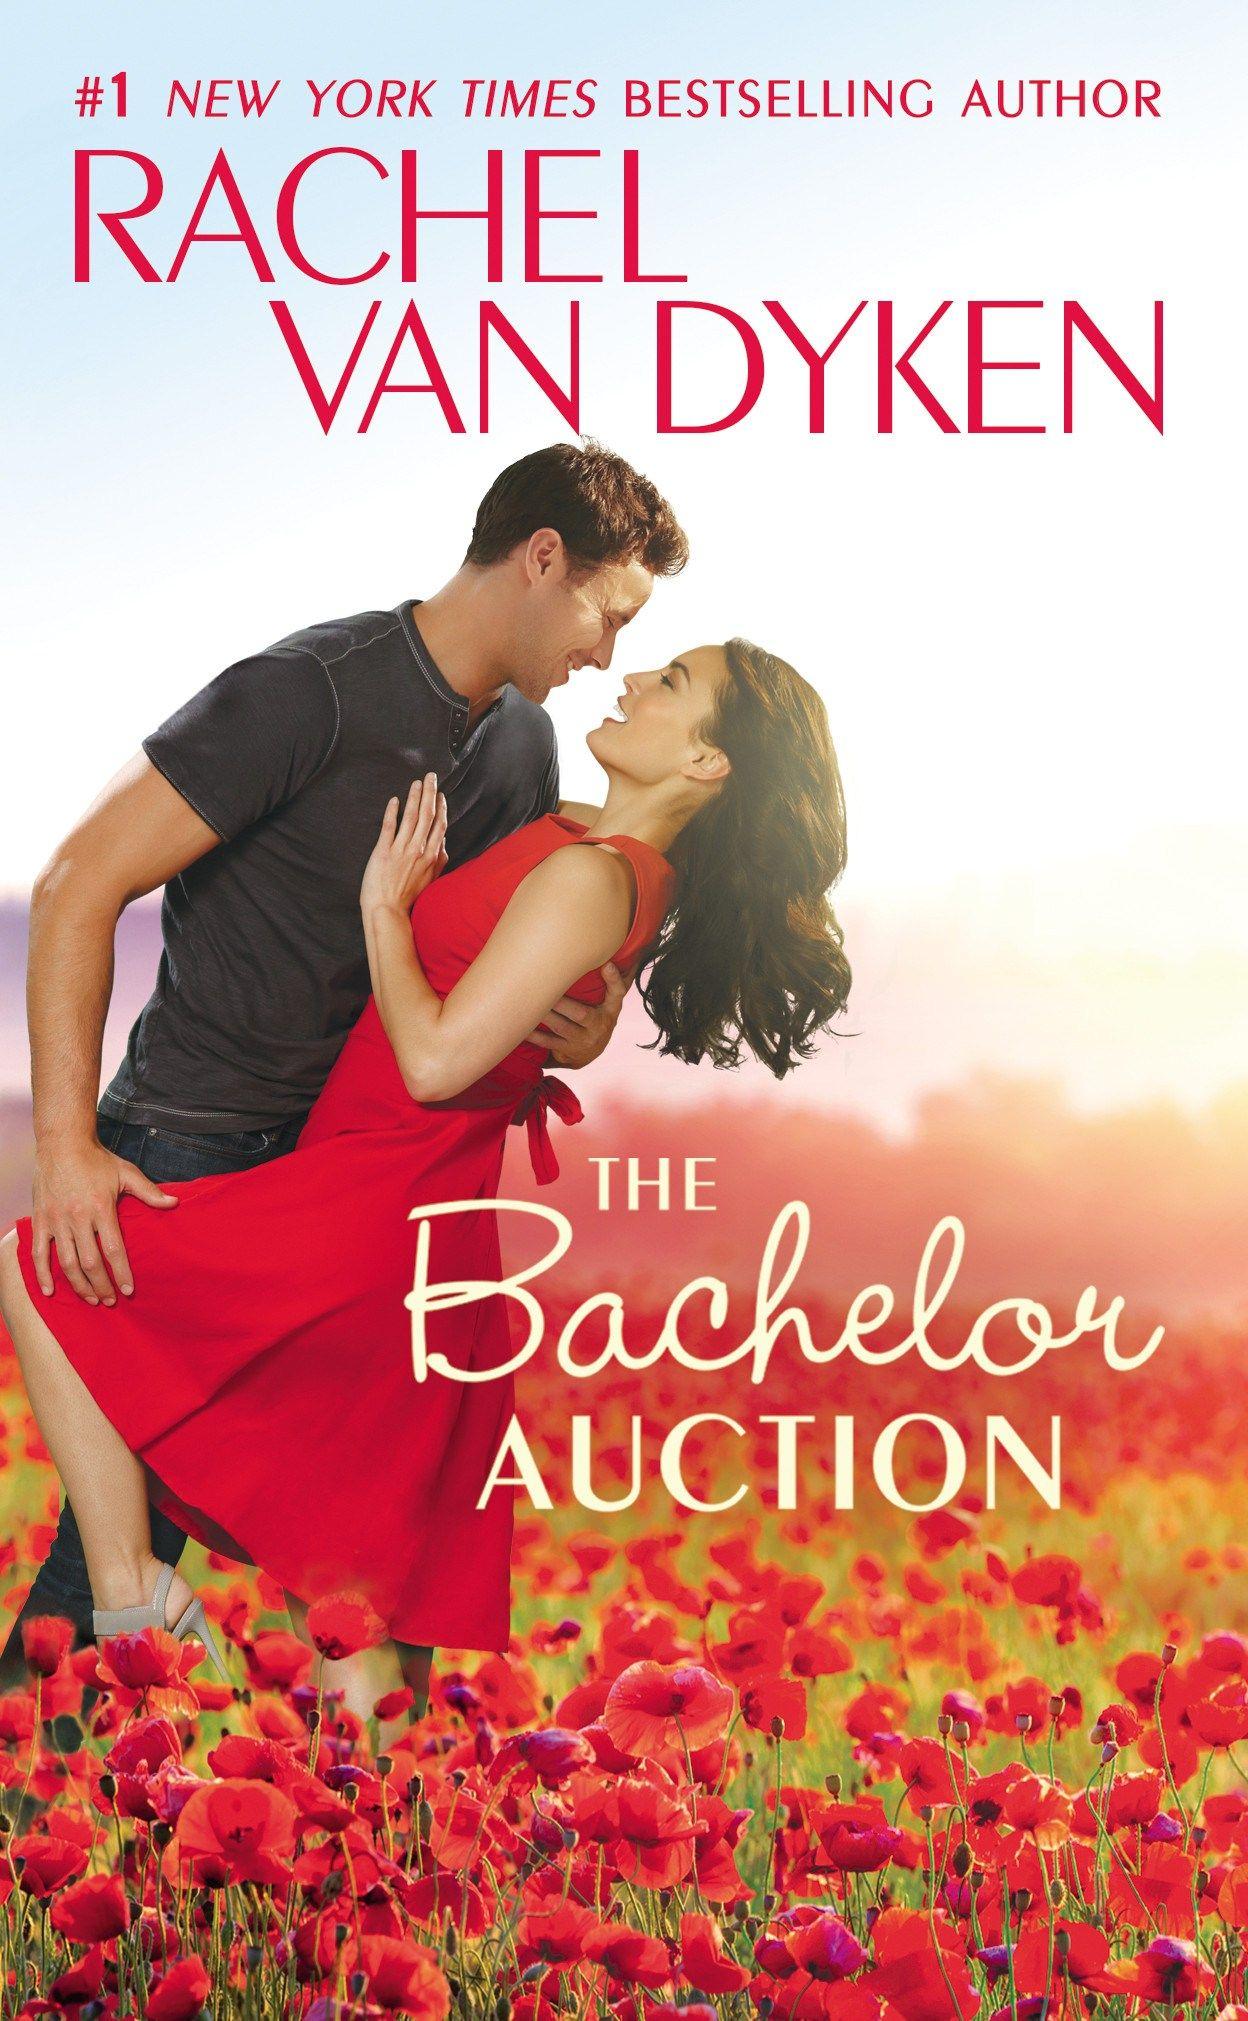 Rachel Van Dyken - The Bachelor Auction / #awordfromJoJo #ContemporaryRomance #RachelVanDyken